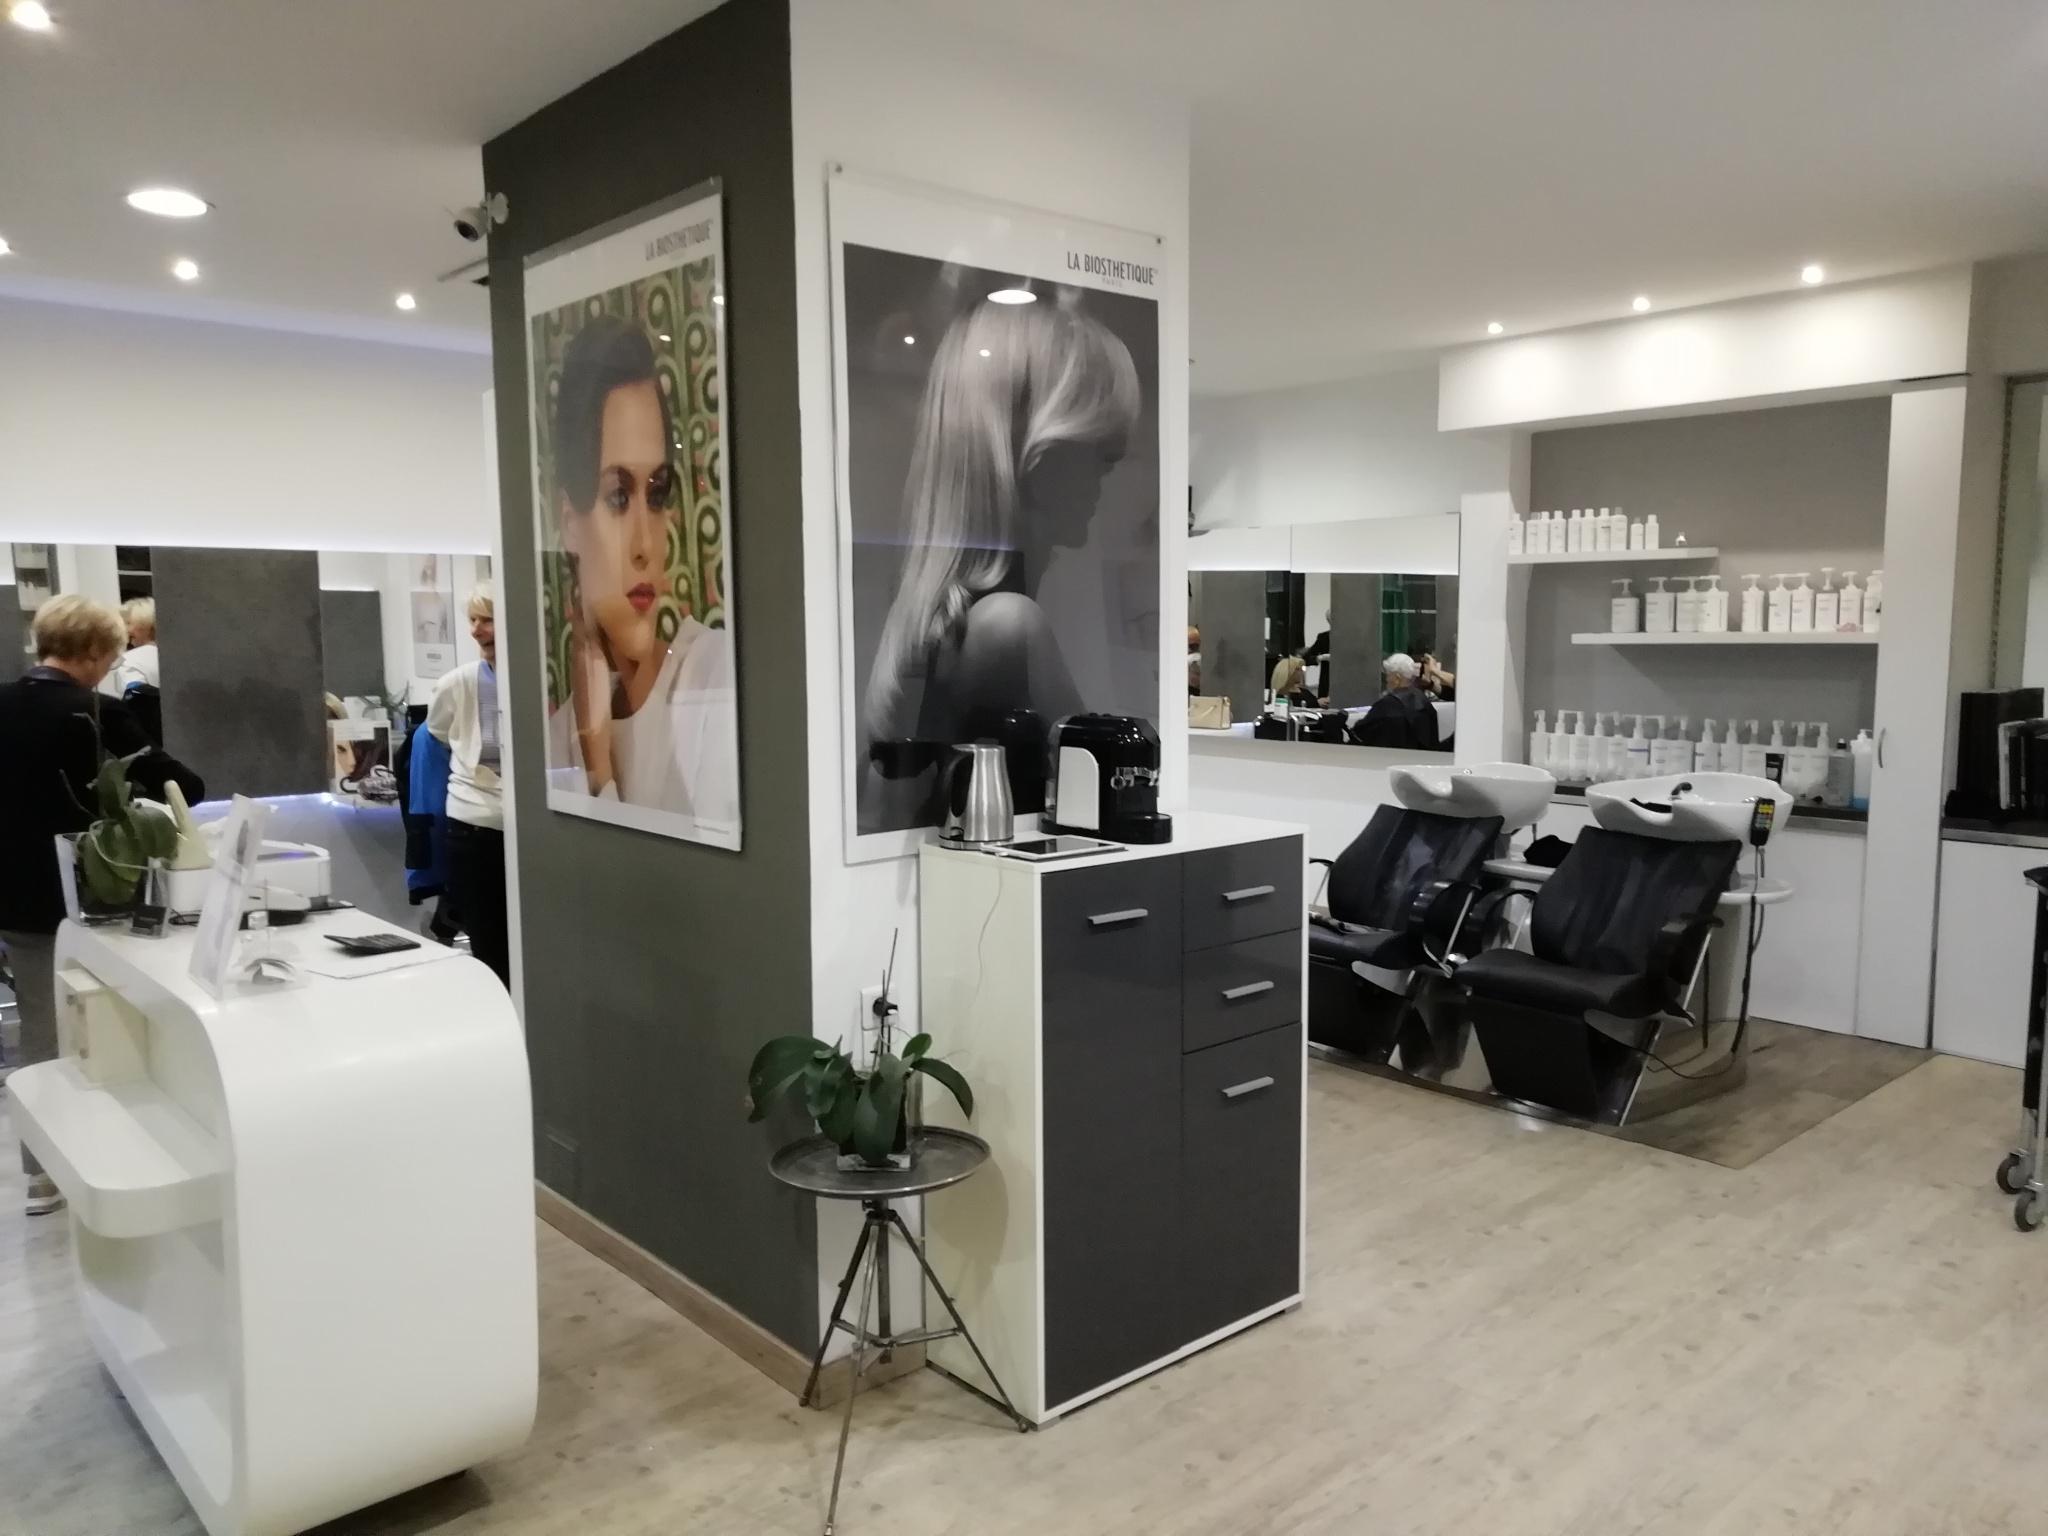 SALON DE COIFFURE NICE CENTRE 90m2  - Salon de Coiffure Esthétique Parfumerie